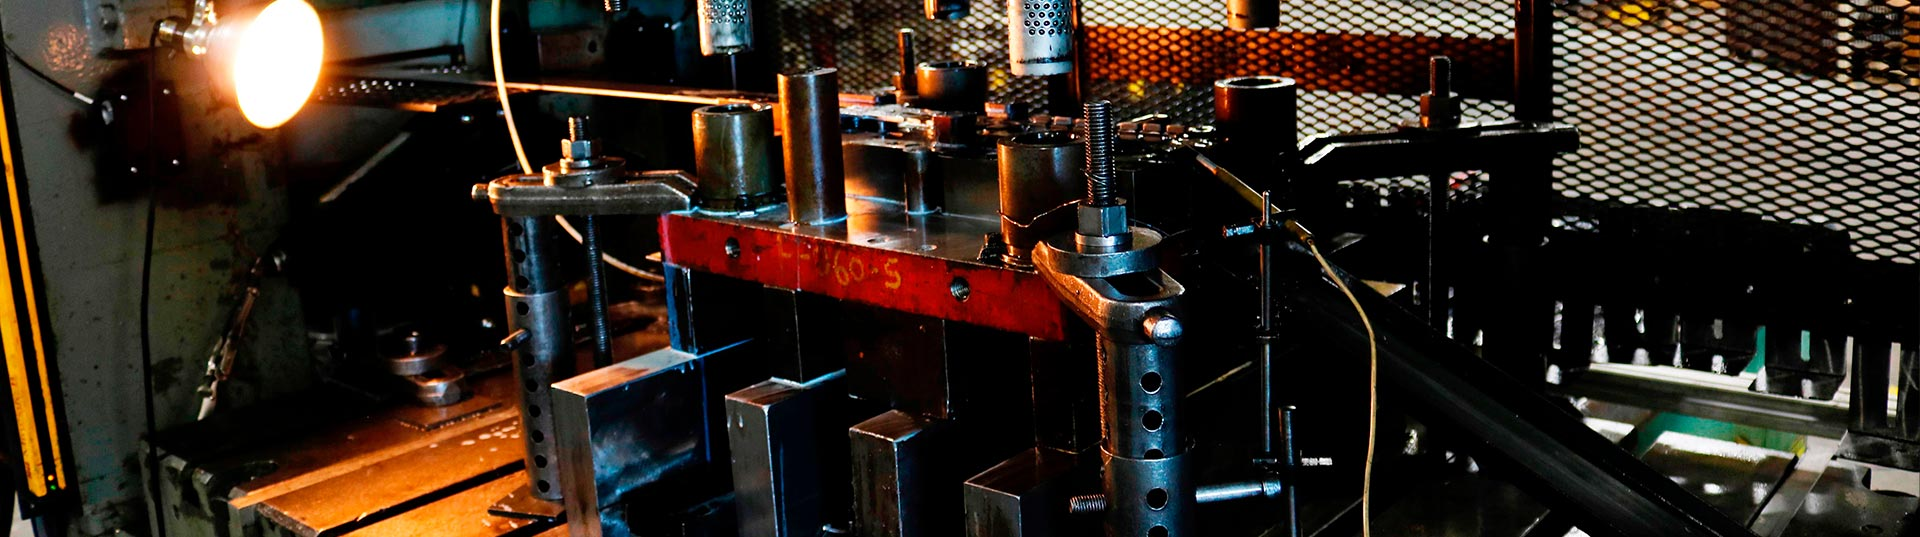 metalworks-slider-01-progressive-stamping-537x1920